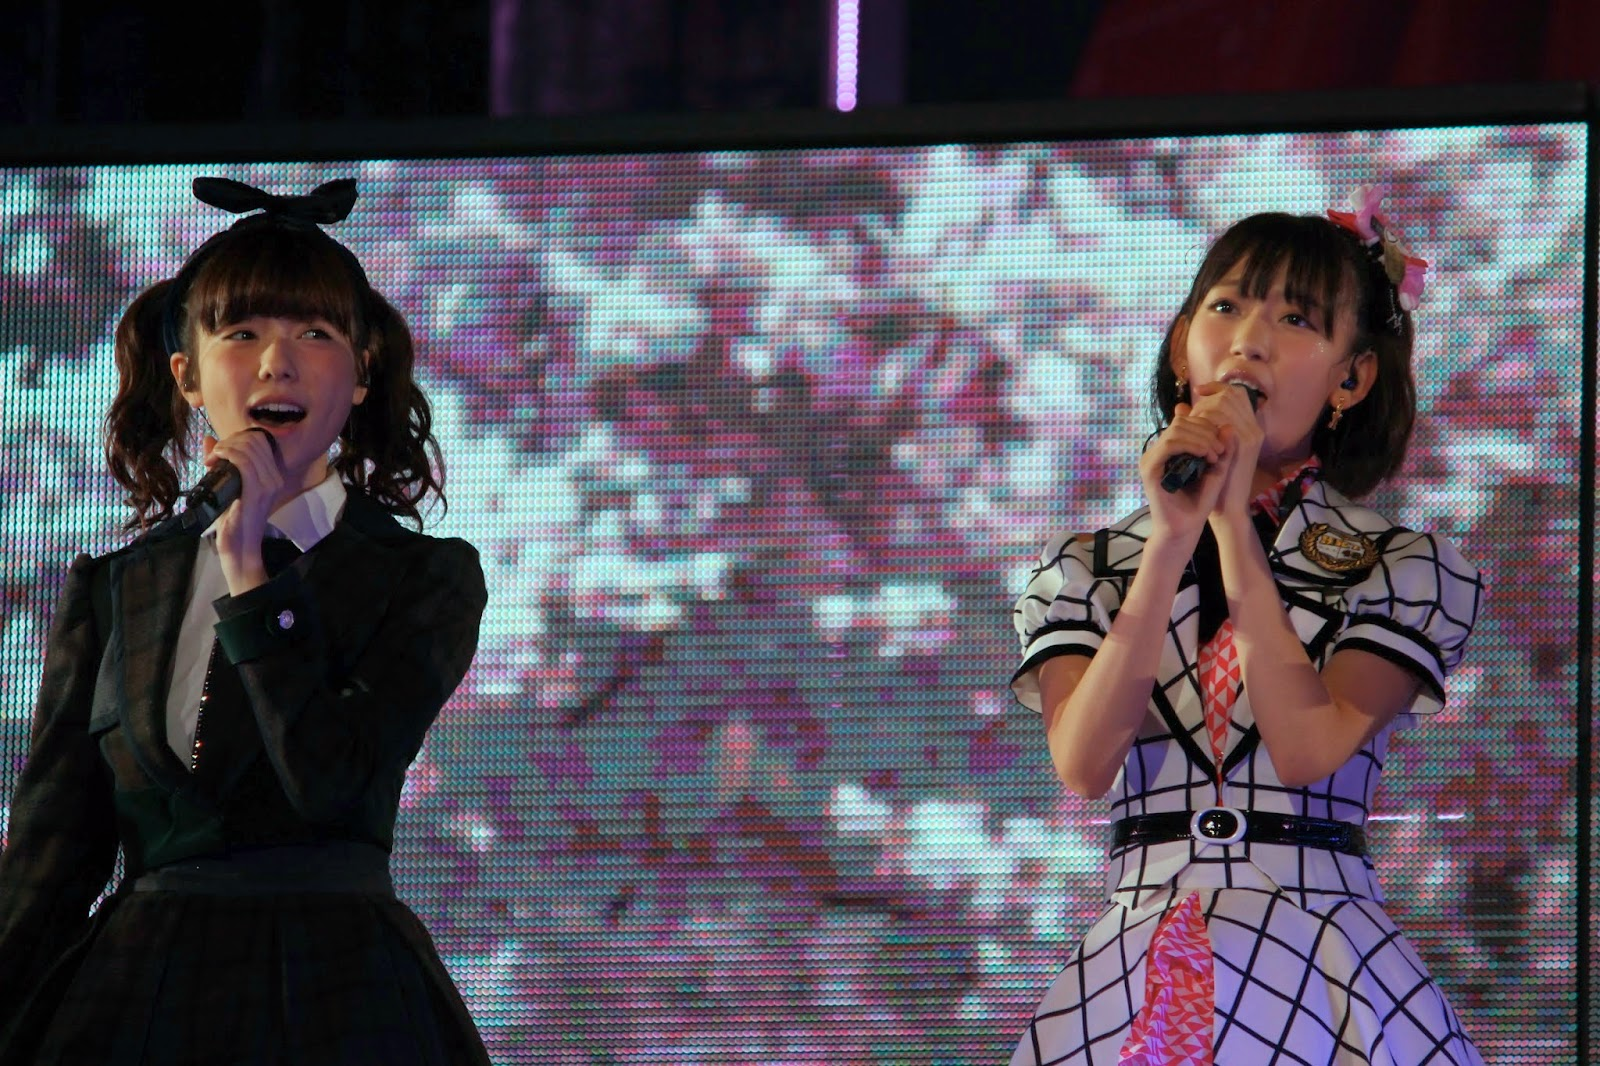 AKB48、ドーム3days公演をパッケージ化 「スイン …